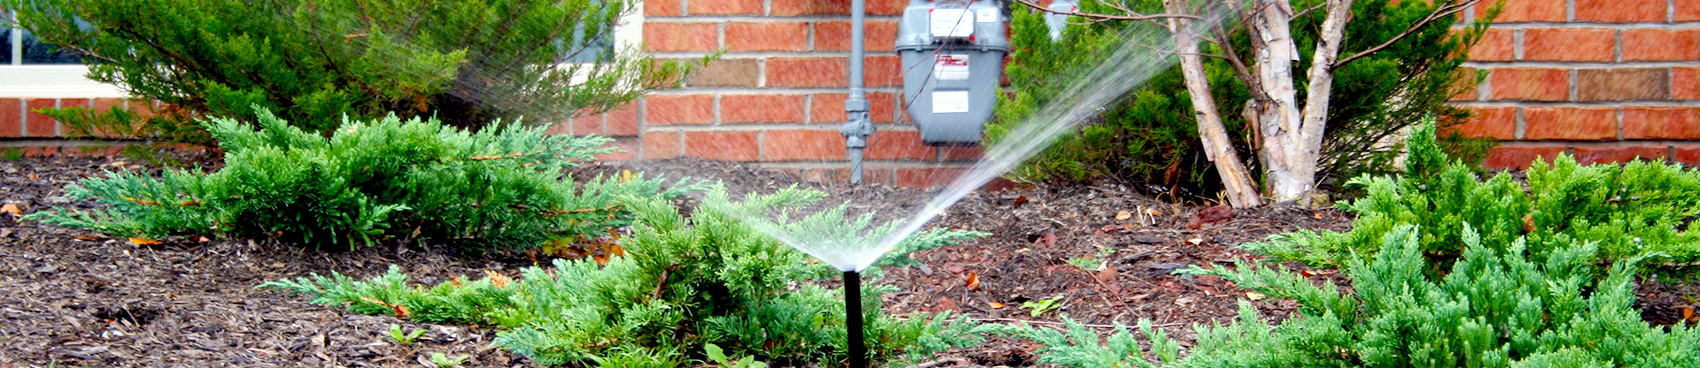 Irrigation Systems Lawn Sprinklers Sprinkler Company